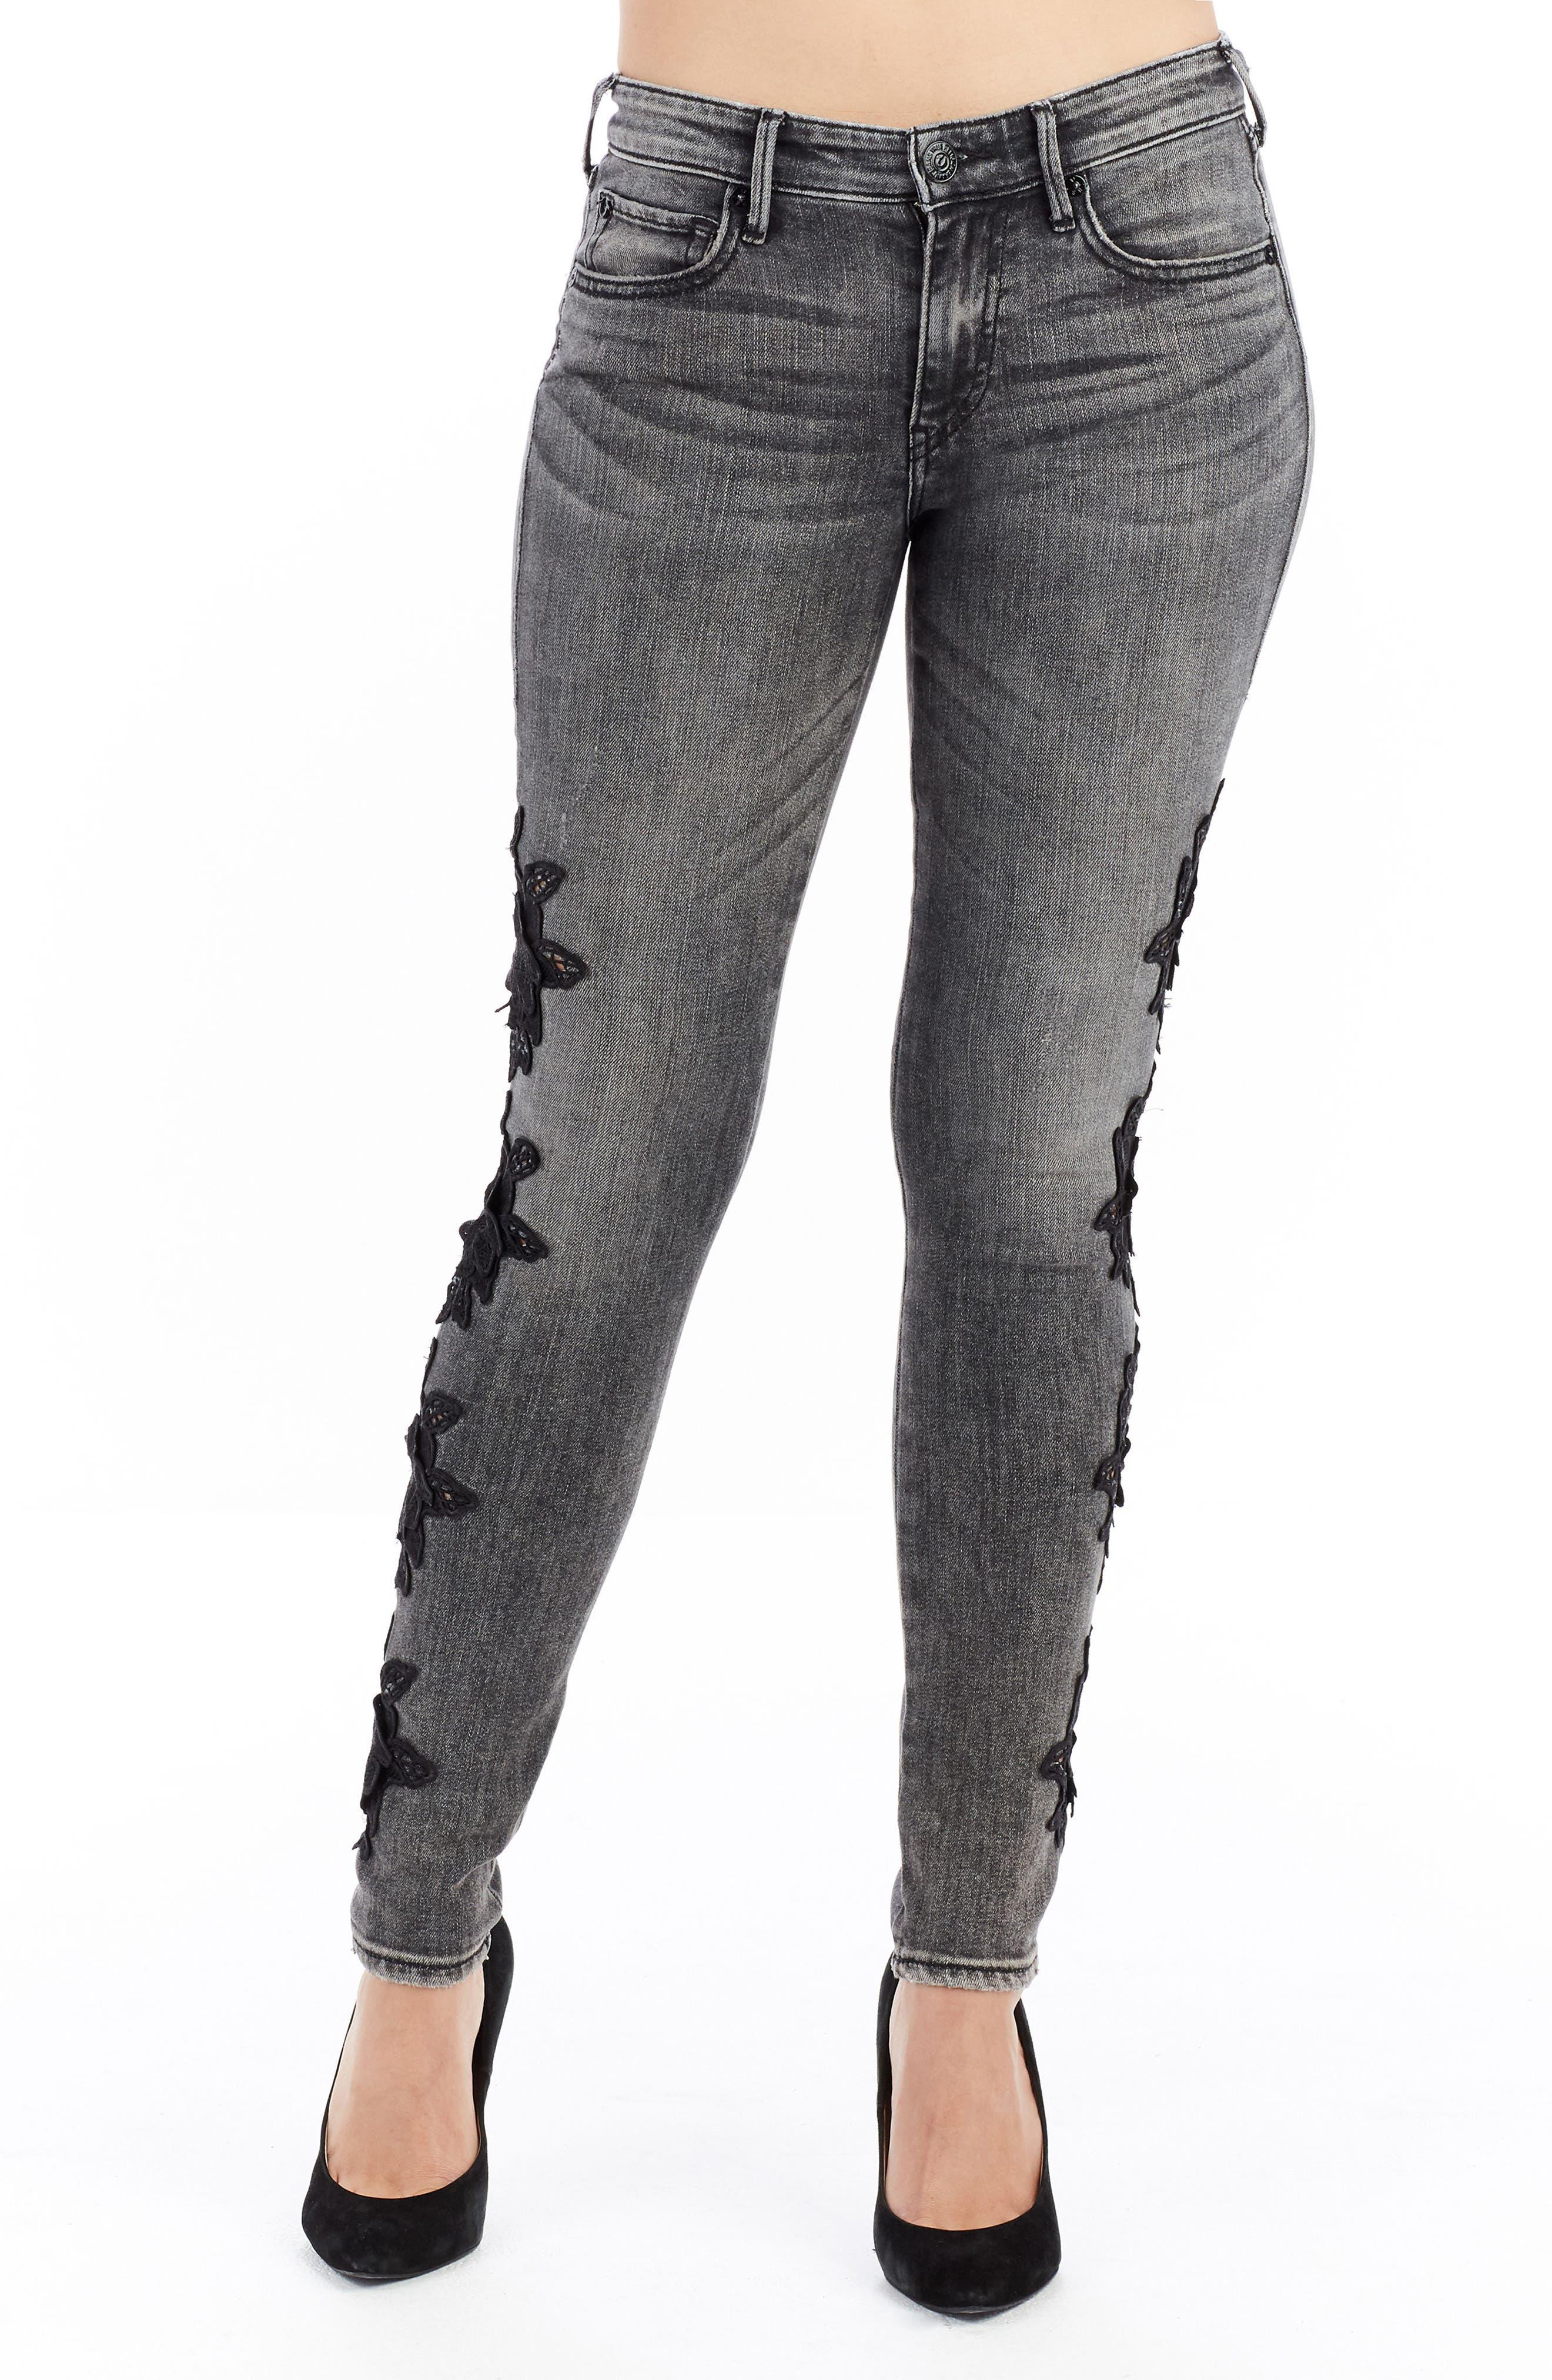 Jennie Curvy Skinny Jeans,                             Main thumbnail 1, color,                             Rhodium